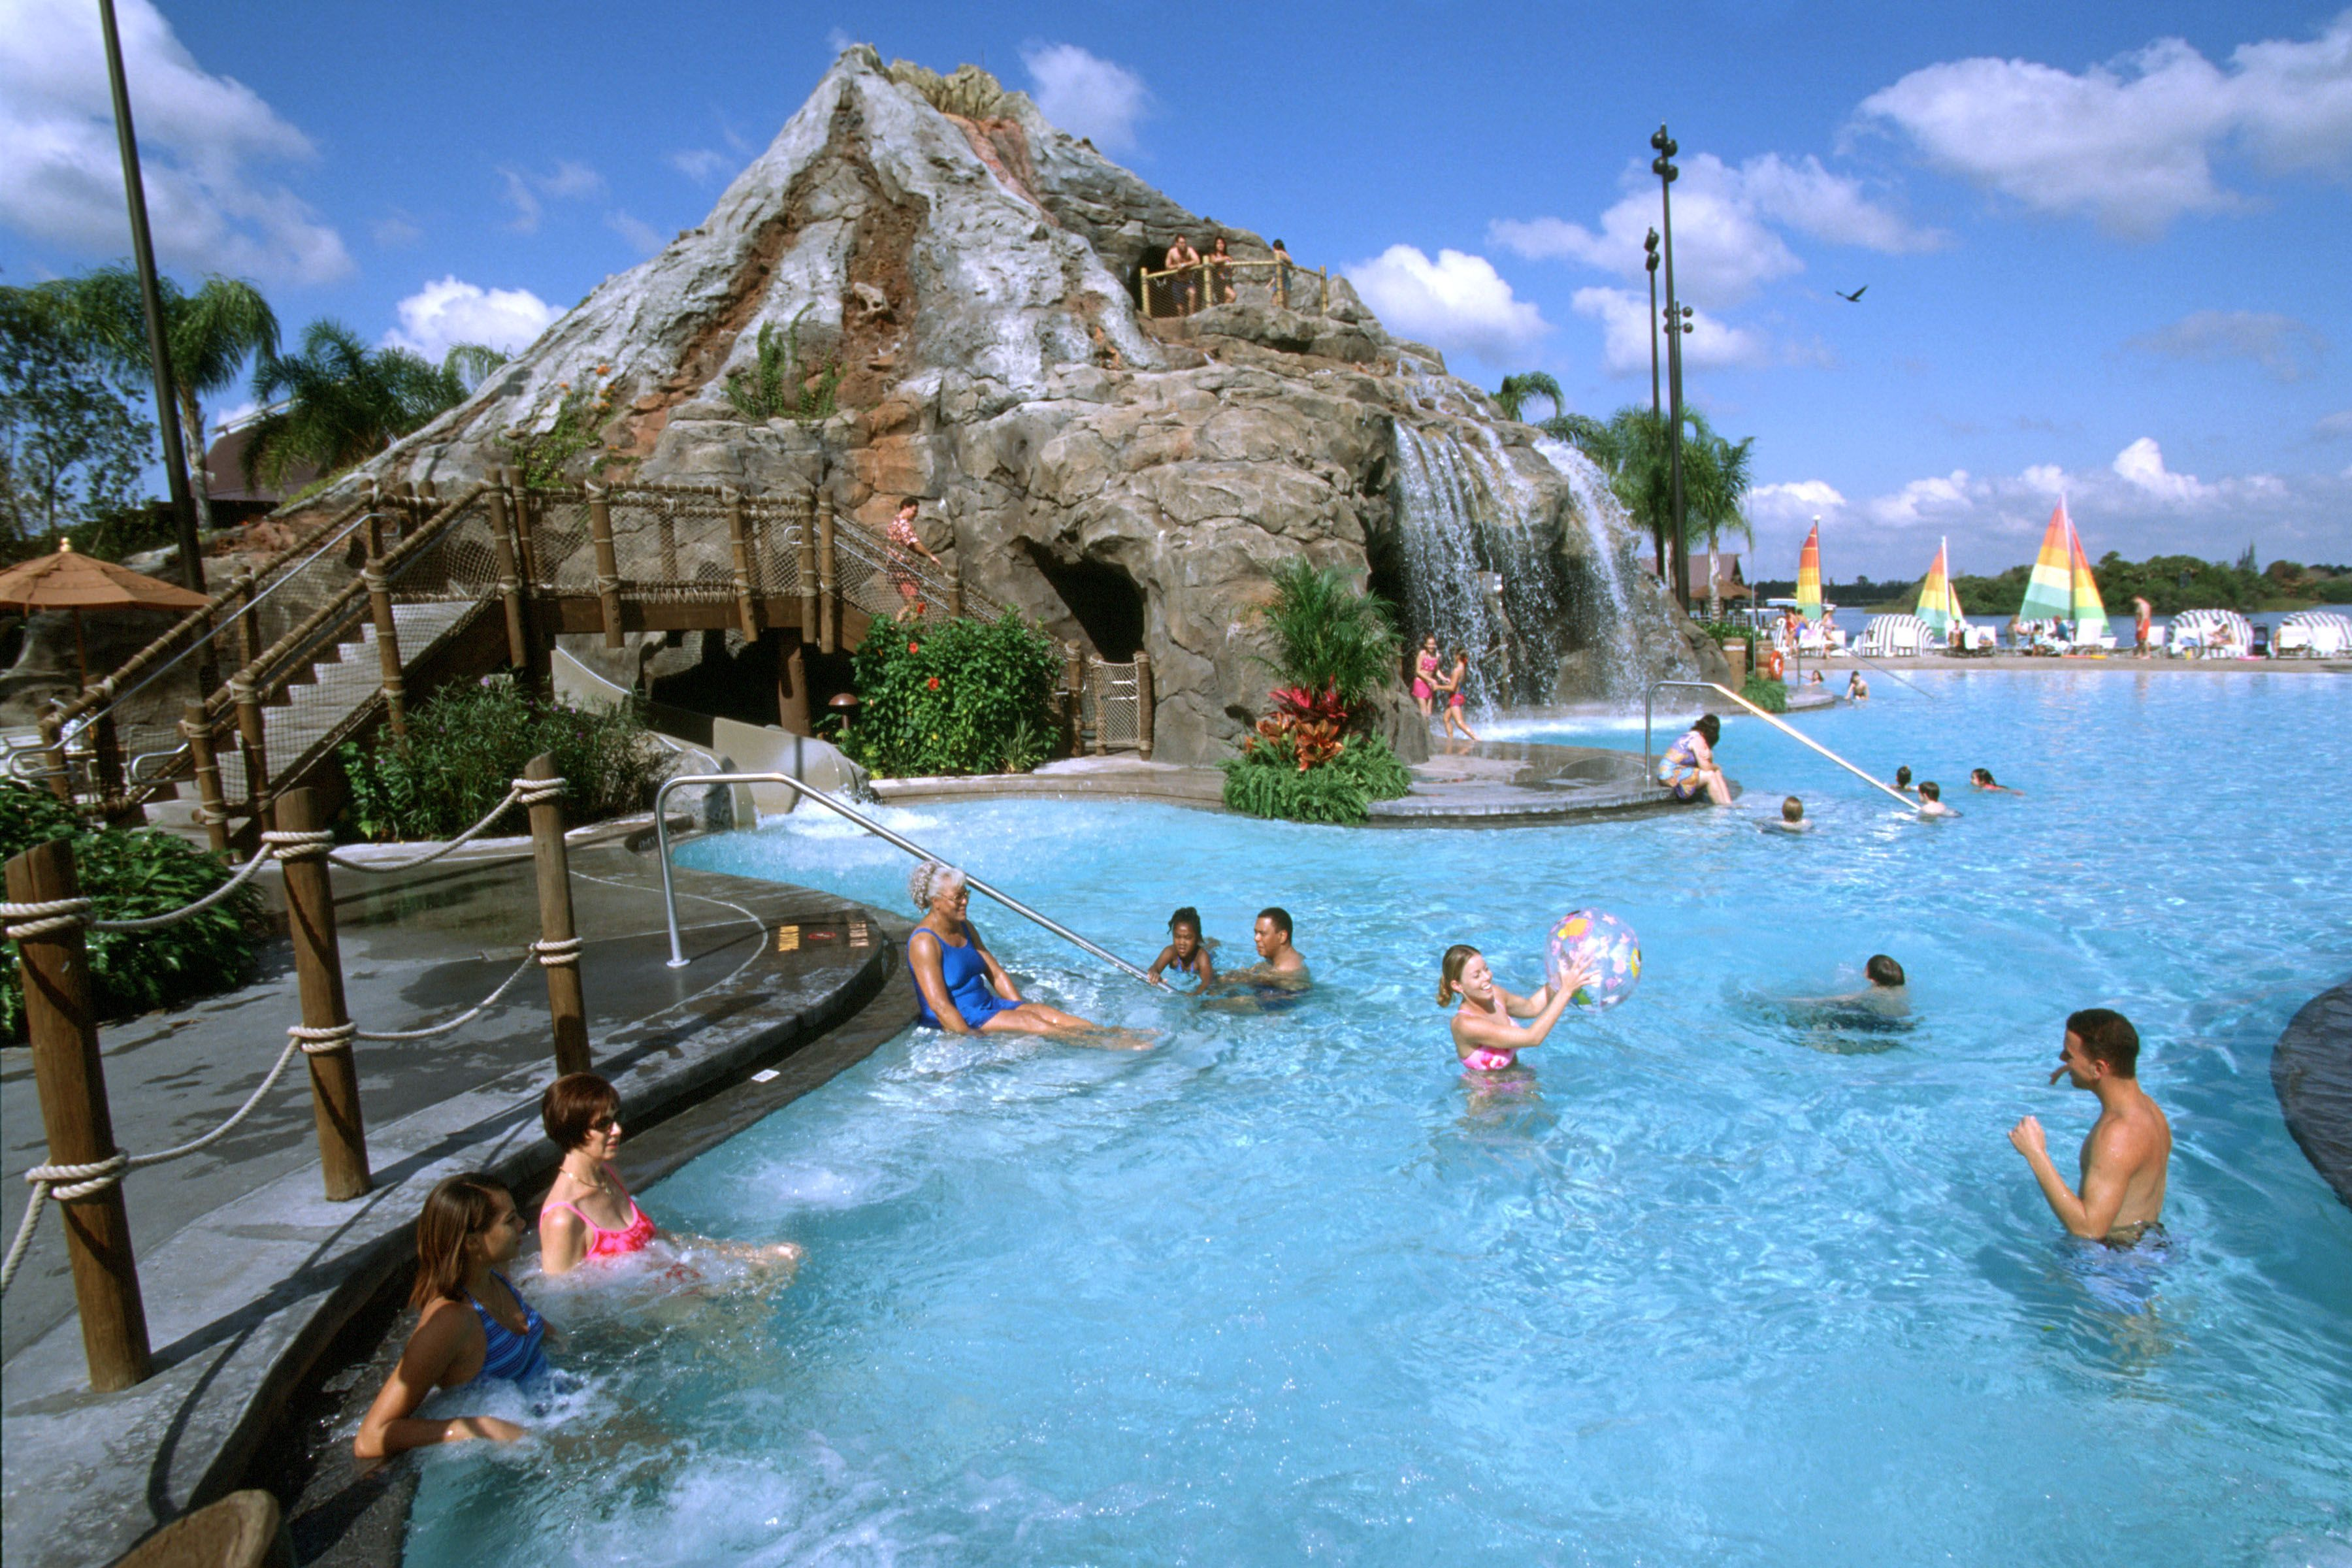 disney resort hotels, disney's polynesian resort - guests in the